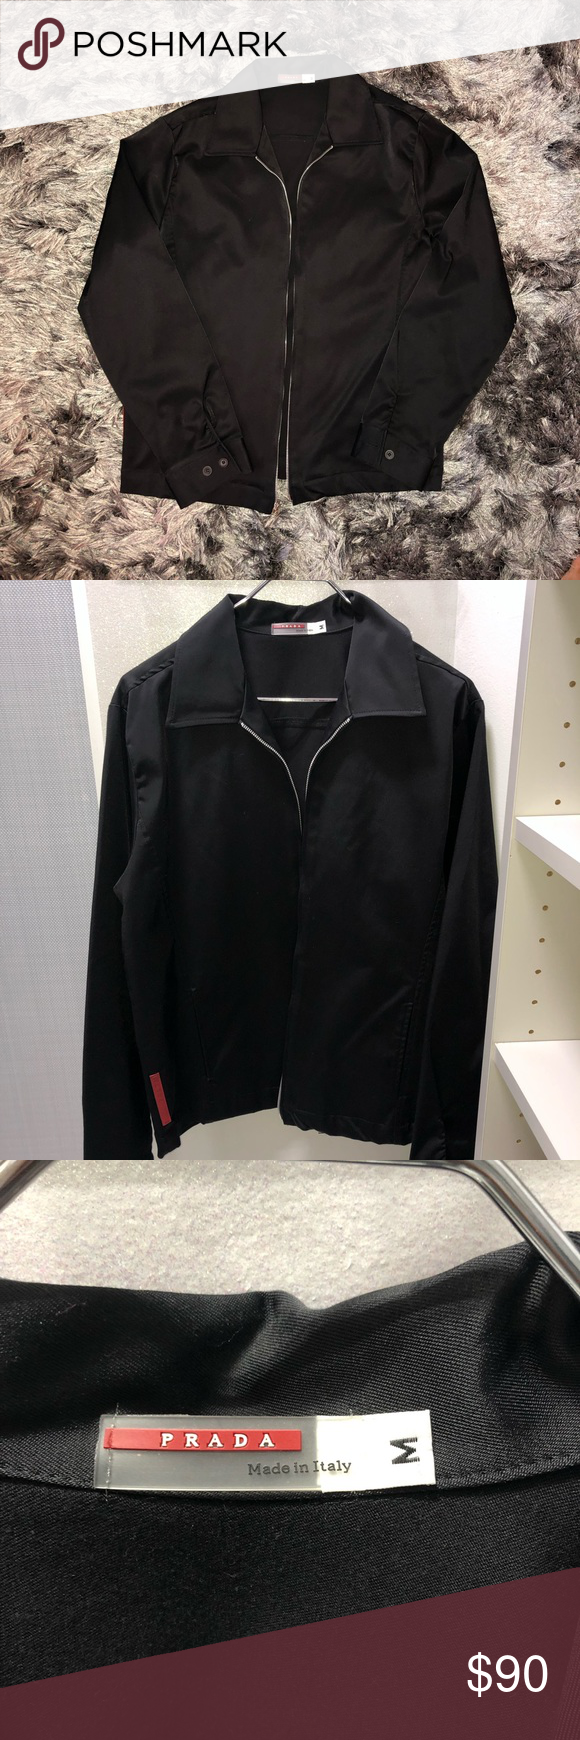 Men S Black Prada Jacket Jackets Prada Jacket Prada [ 1740 x 580 Pixel ]